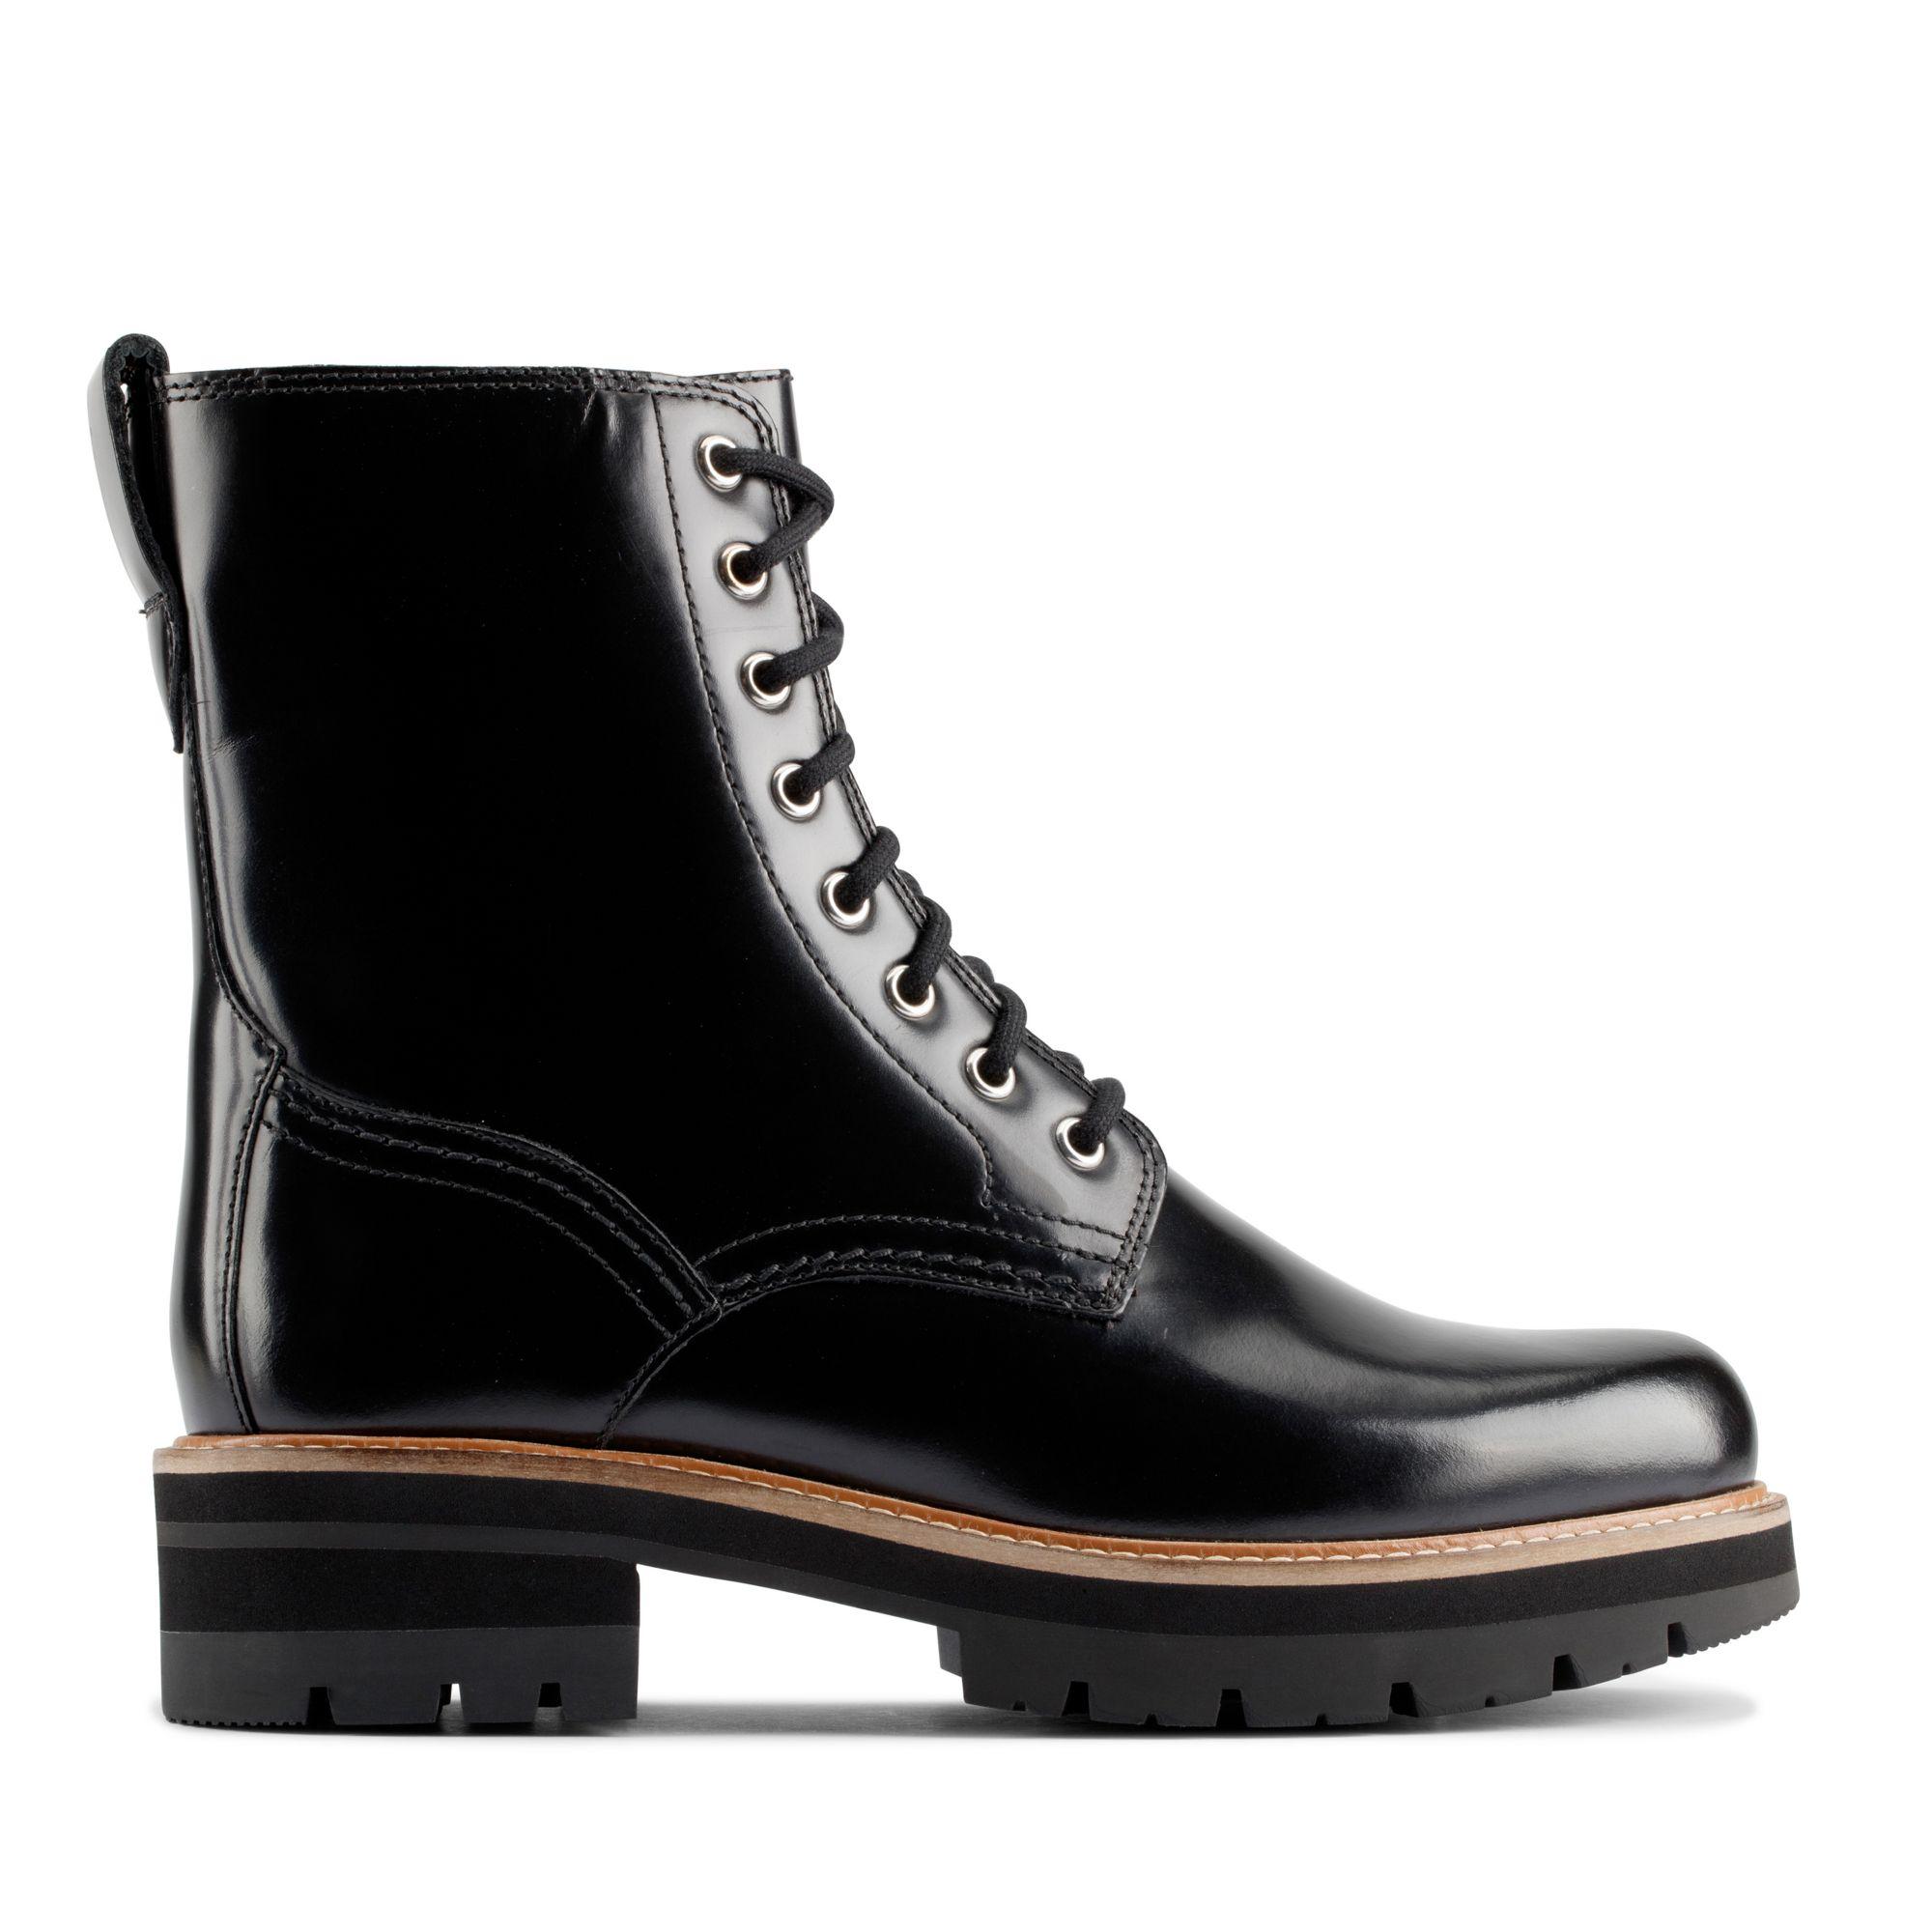 Clarks Orianna Hi – Leather